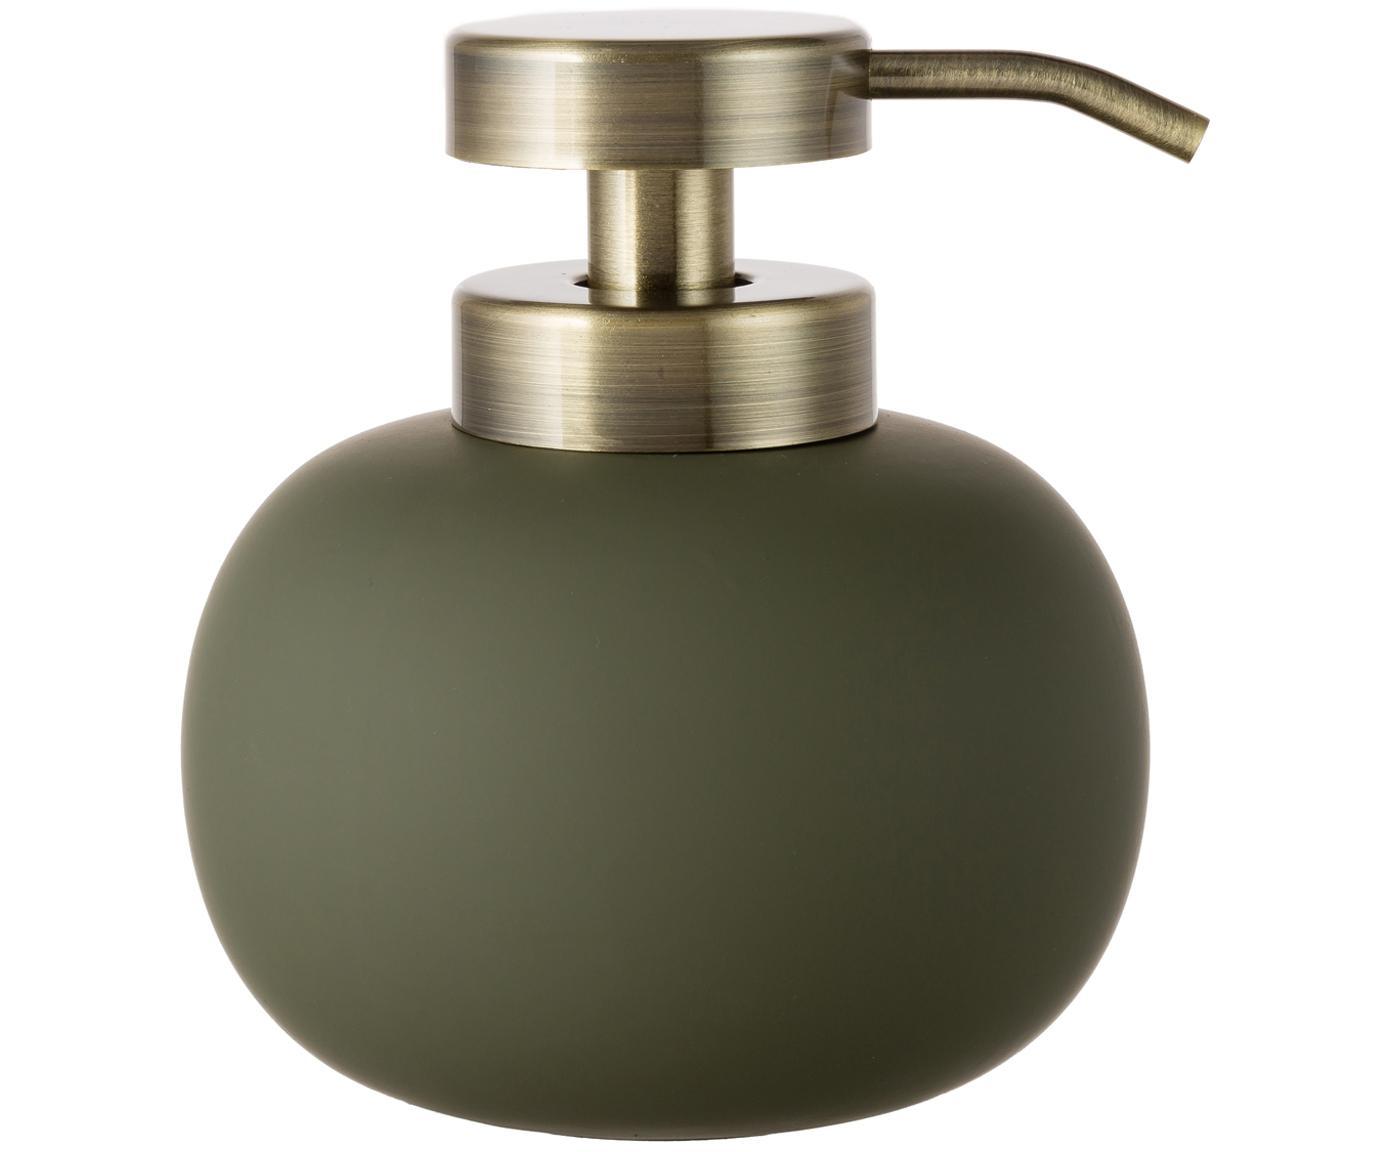 Keramik-Seifenspender Lotus, Behälter: Keramik, Pumpkopf: Metall, Olivengrün, Messingfarben, Ø 11 x H 13 cm